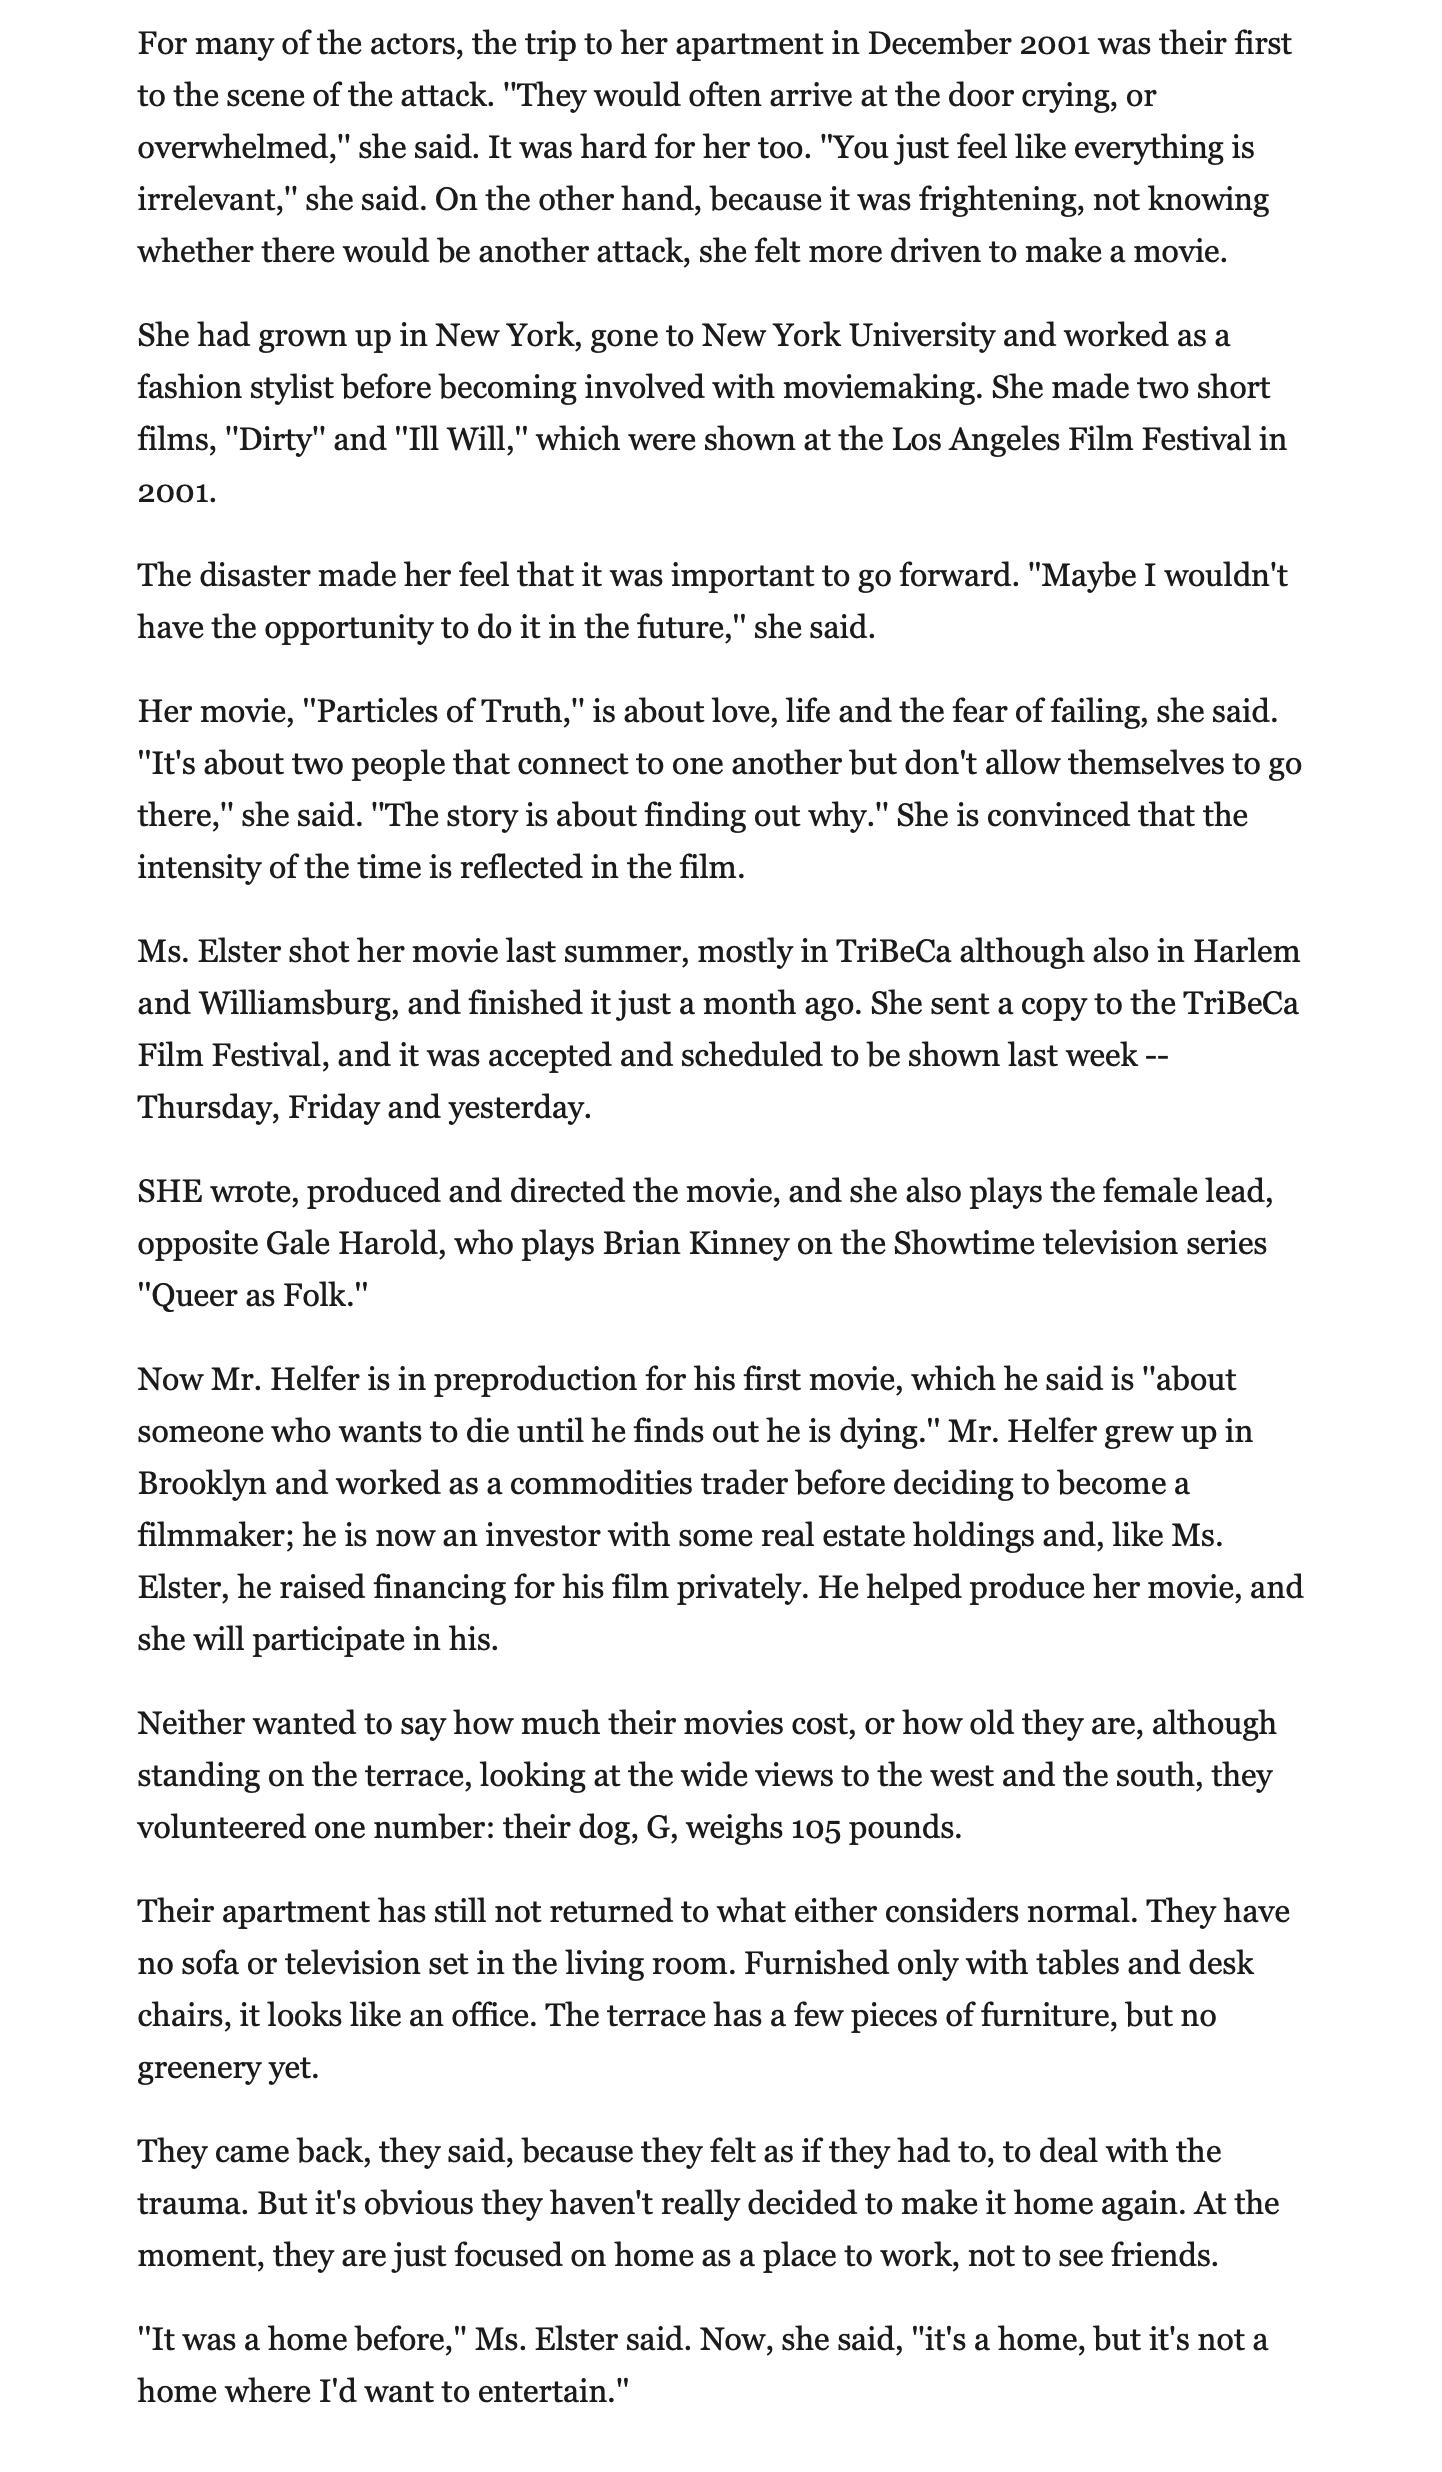 New-York-Times-Press-Jennifer-Elster-Habitats:Battery-Park-City-Interrupted-by-Sept.11-A-Filmmaker-Resumes_2.png